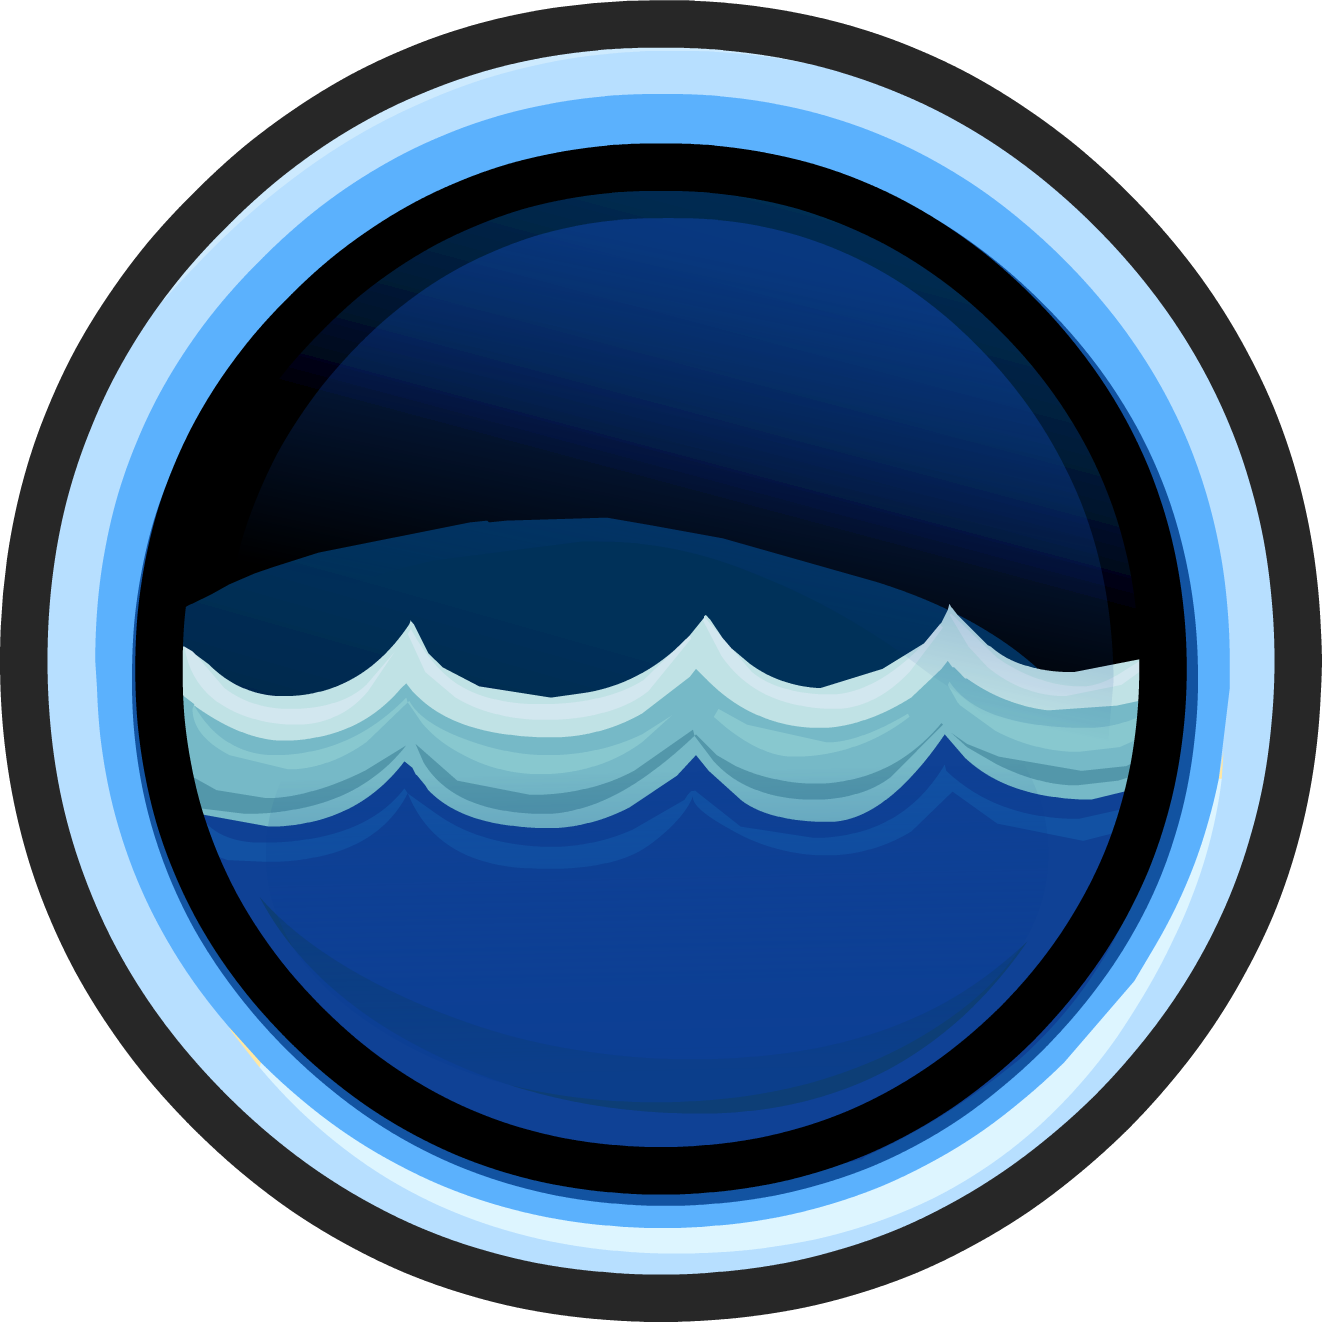 Image Water Element Symbolg Club Penguin Wiki Fandom